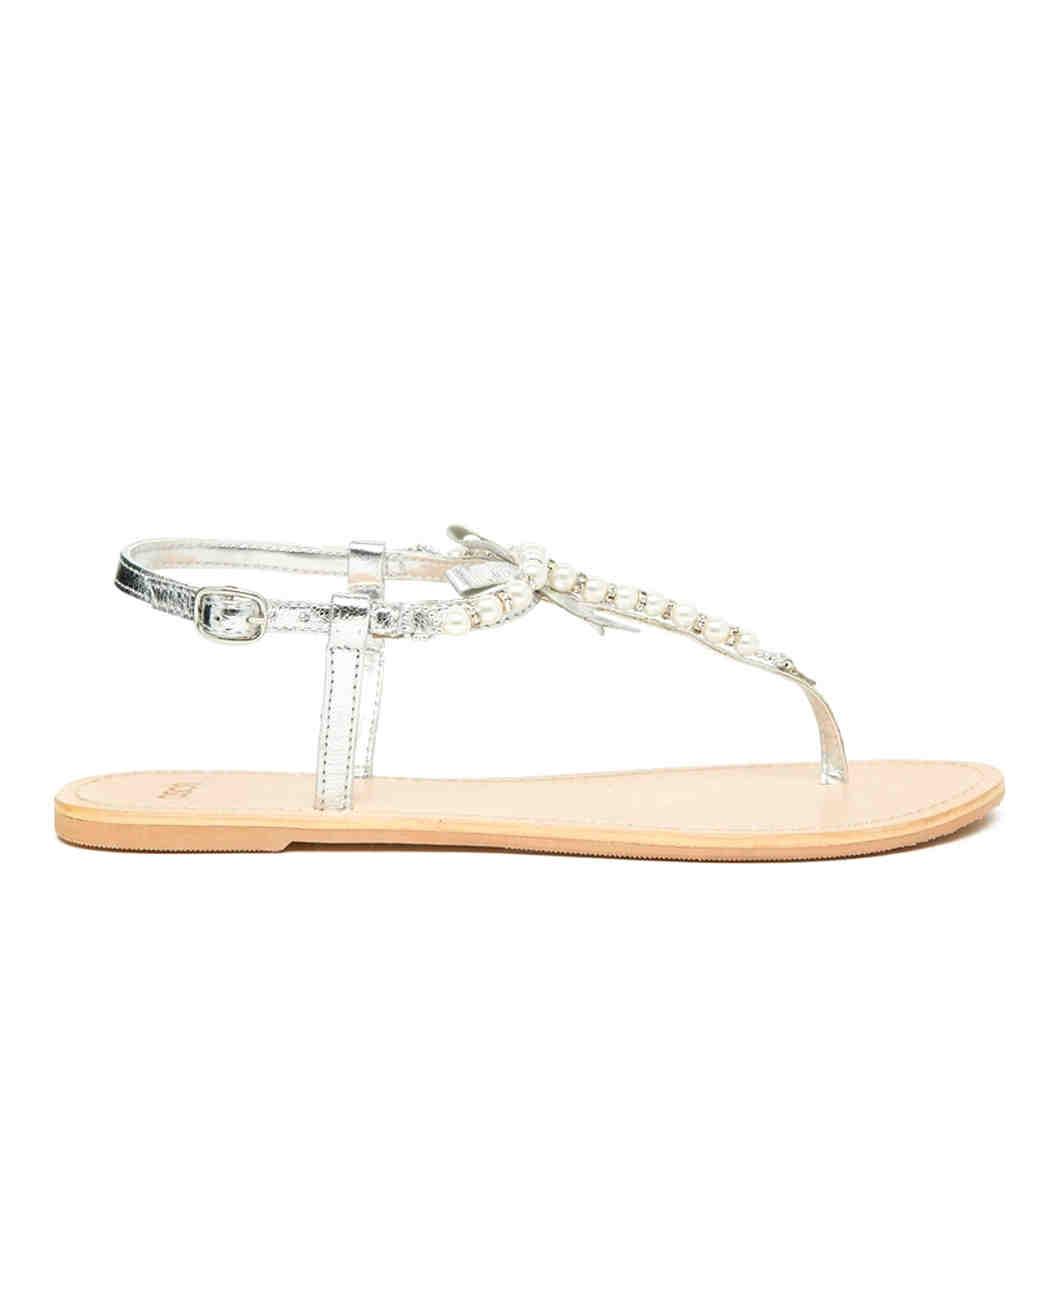 summer-wedding-shoes-asos-funder-leather-sandals-0515.jpg